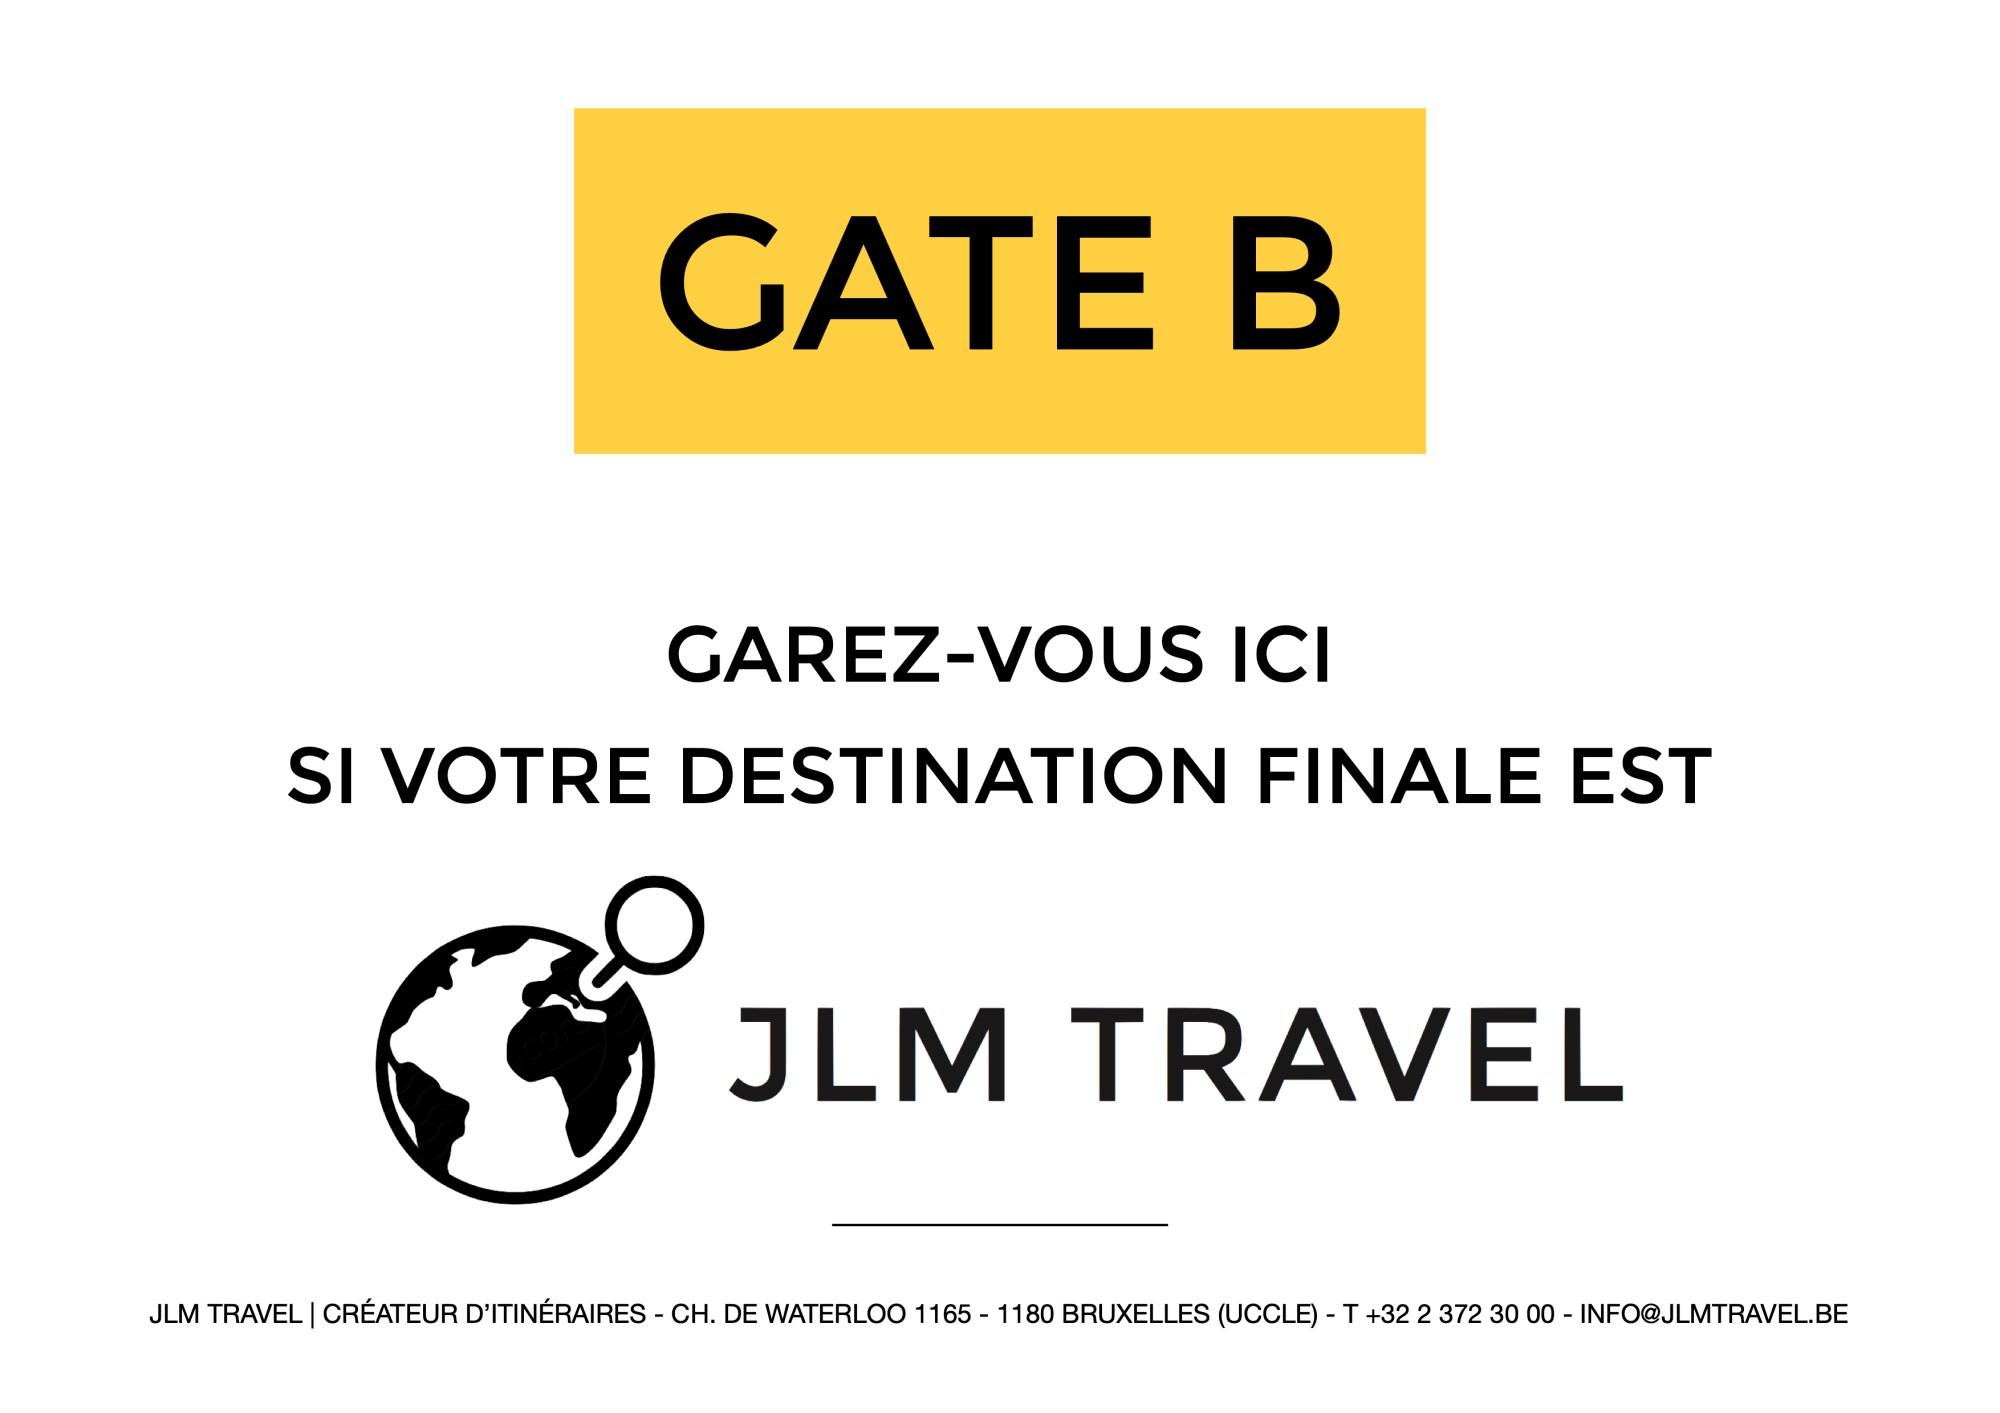 Le terminal JLM Travel